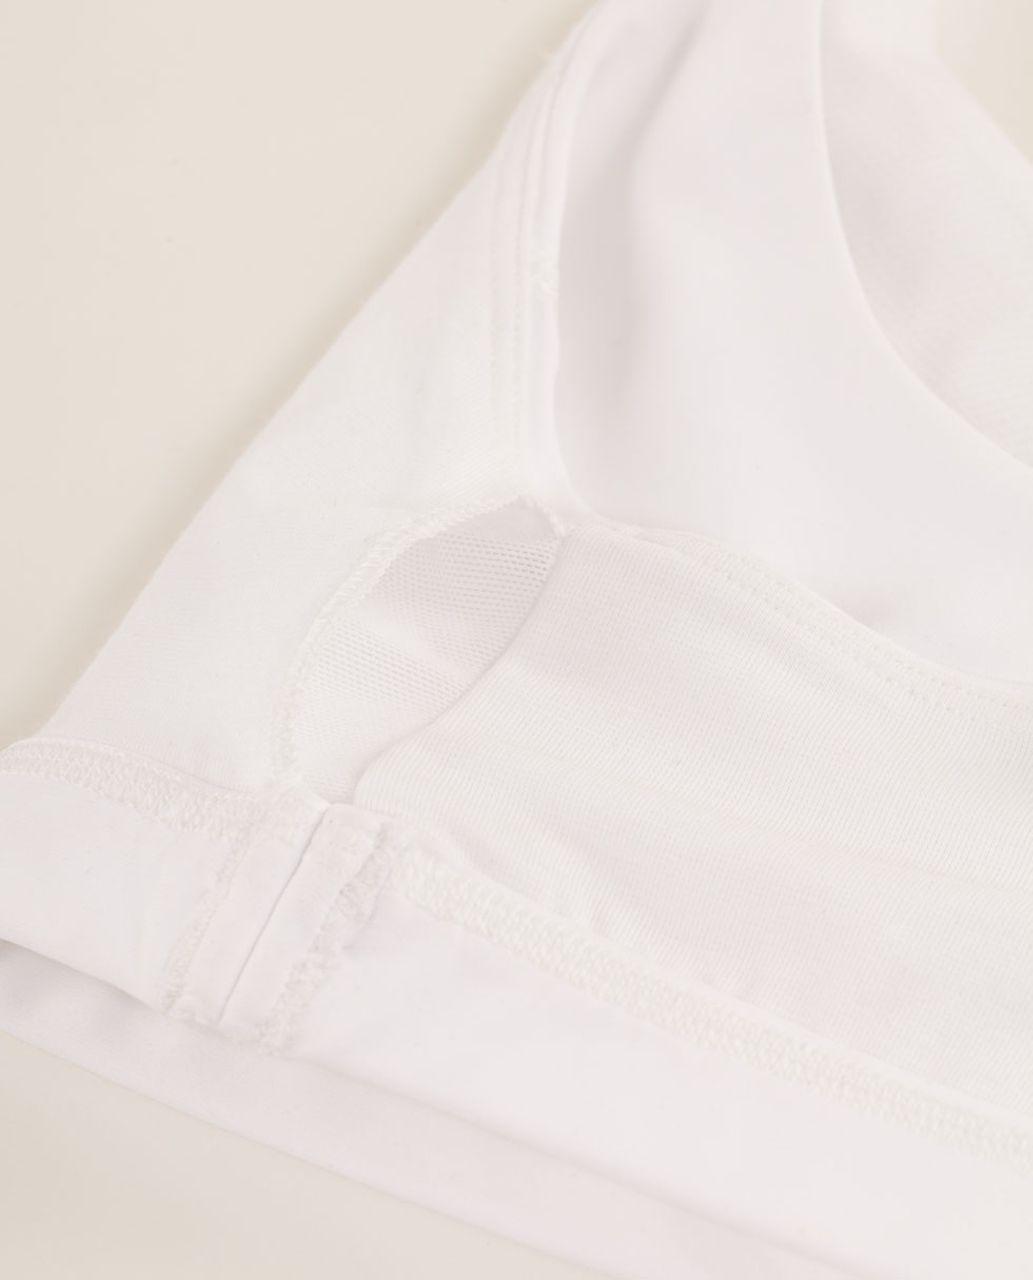 Lululemon Run:  Stuff Your Bra II - White /  Nimbus